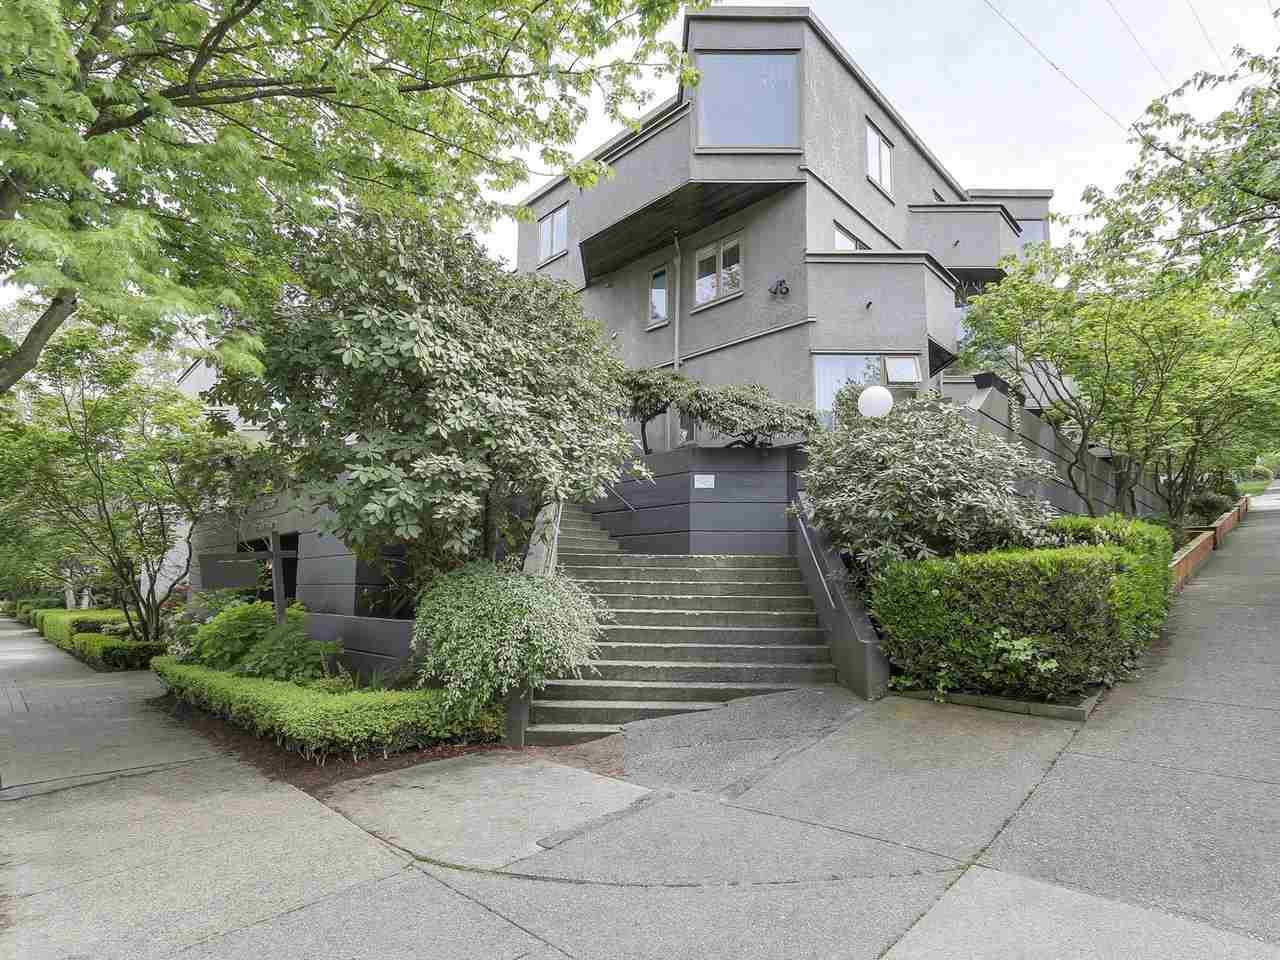 58 870 W 7TH AVENUE, Vancouver, BC, V5Z 4C1 Primary Photo